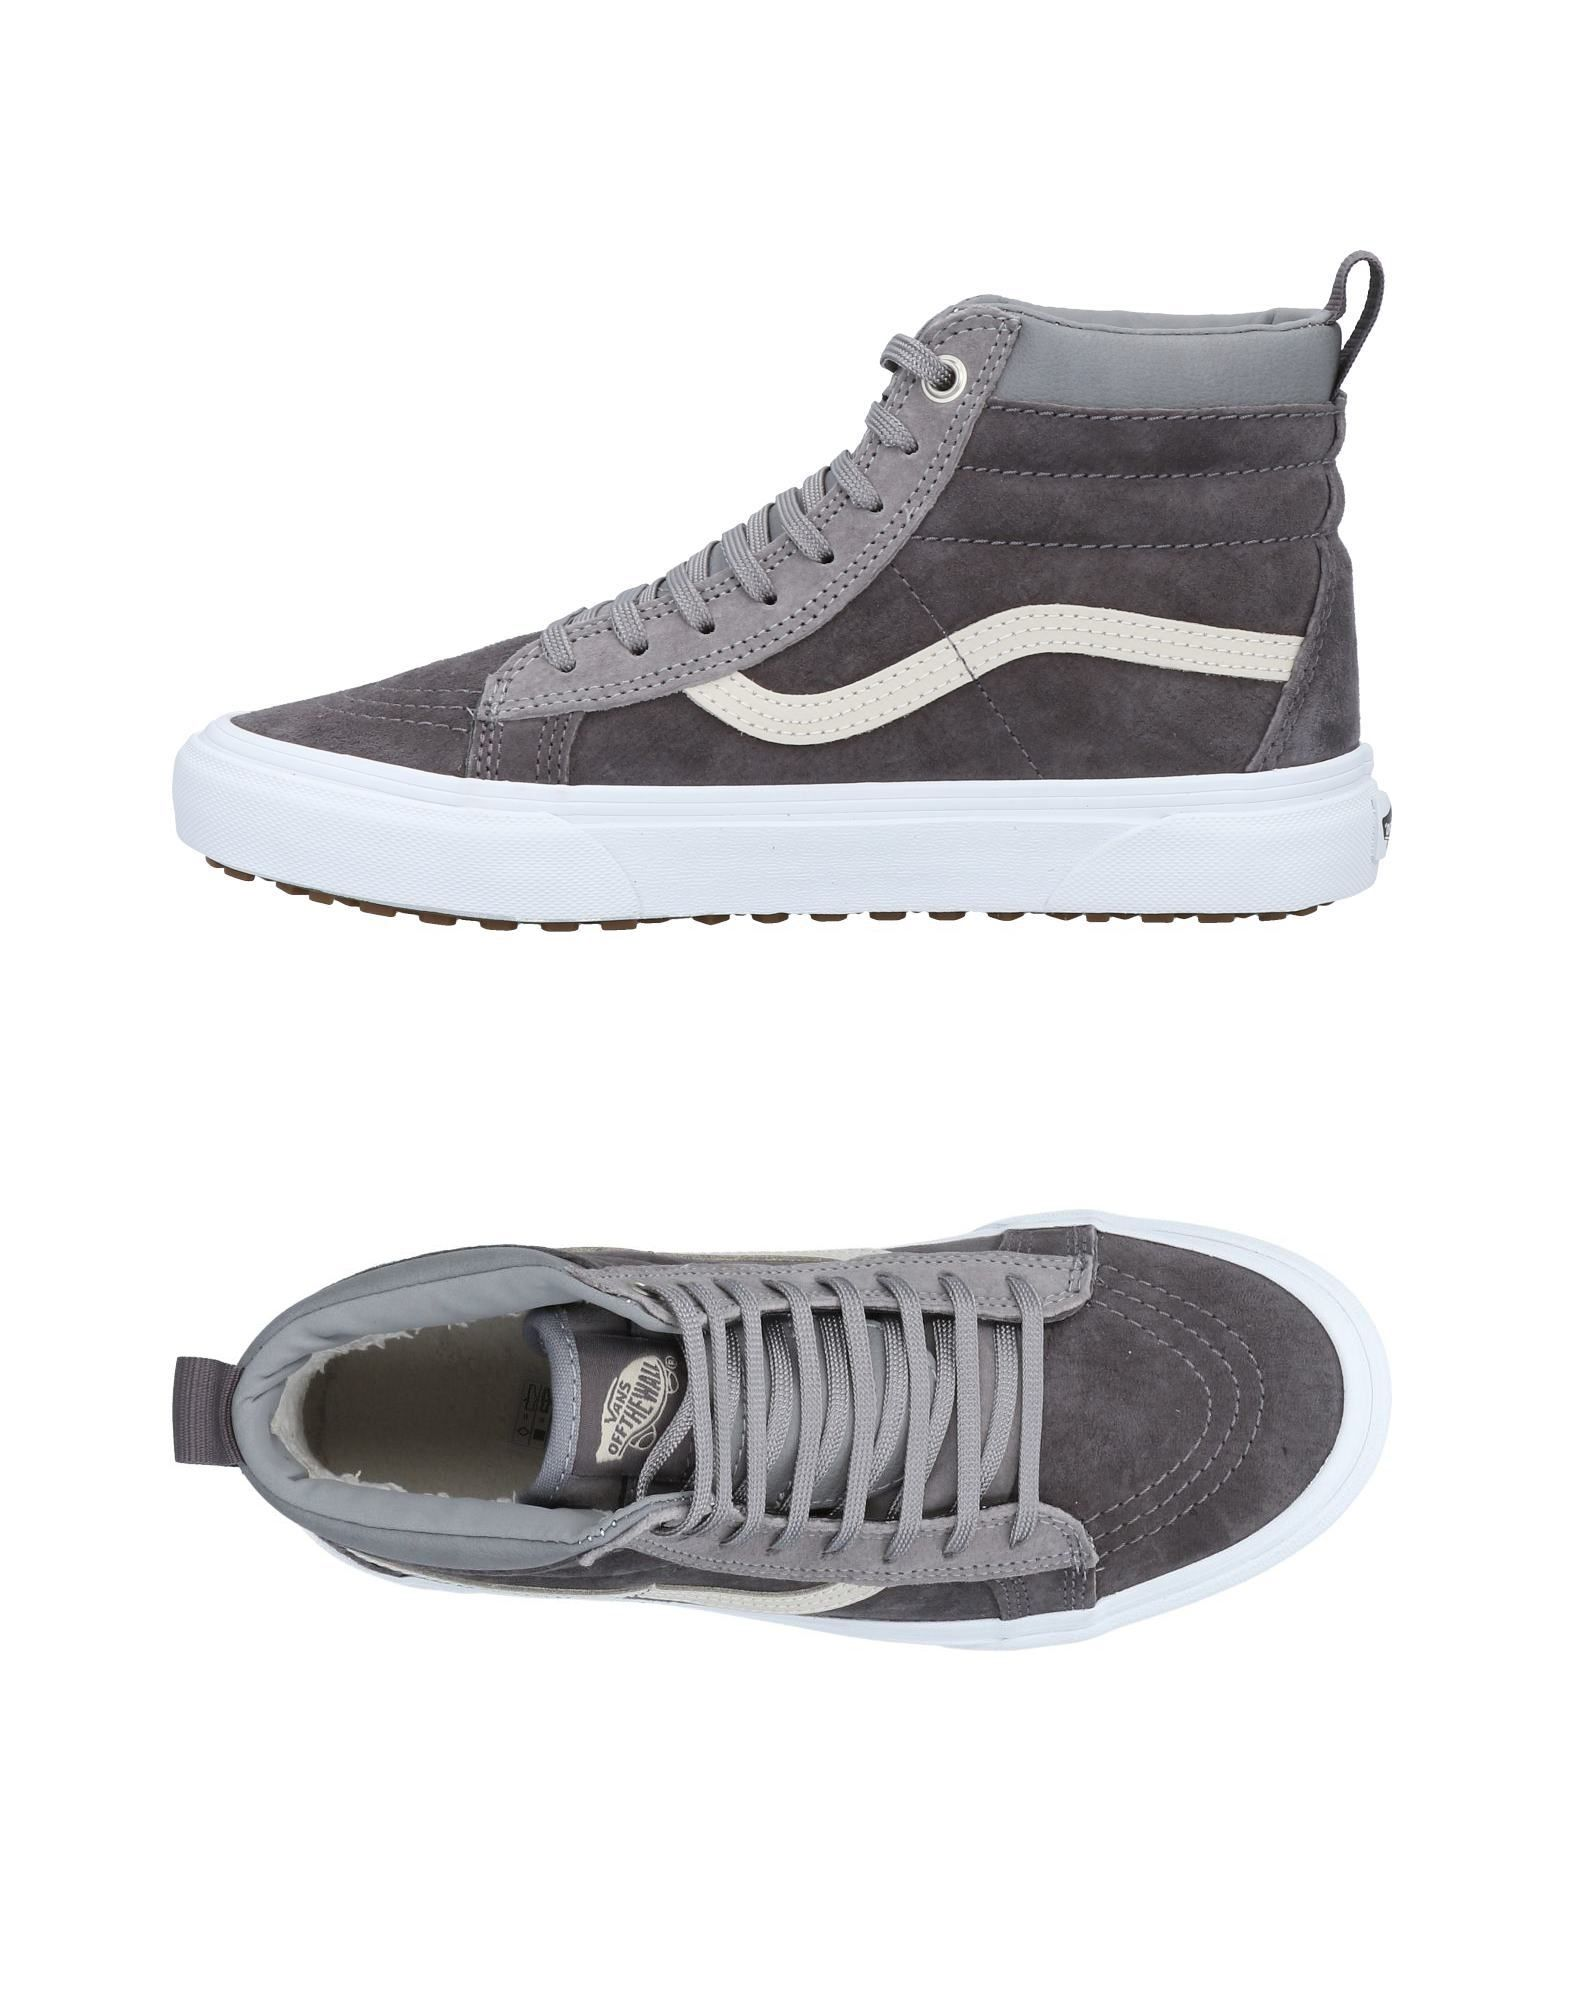 Vans Sneakers Damen   Damen 11492154VW  2e932d